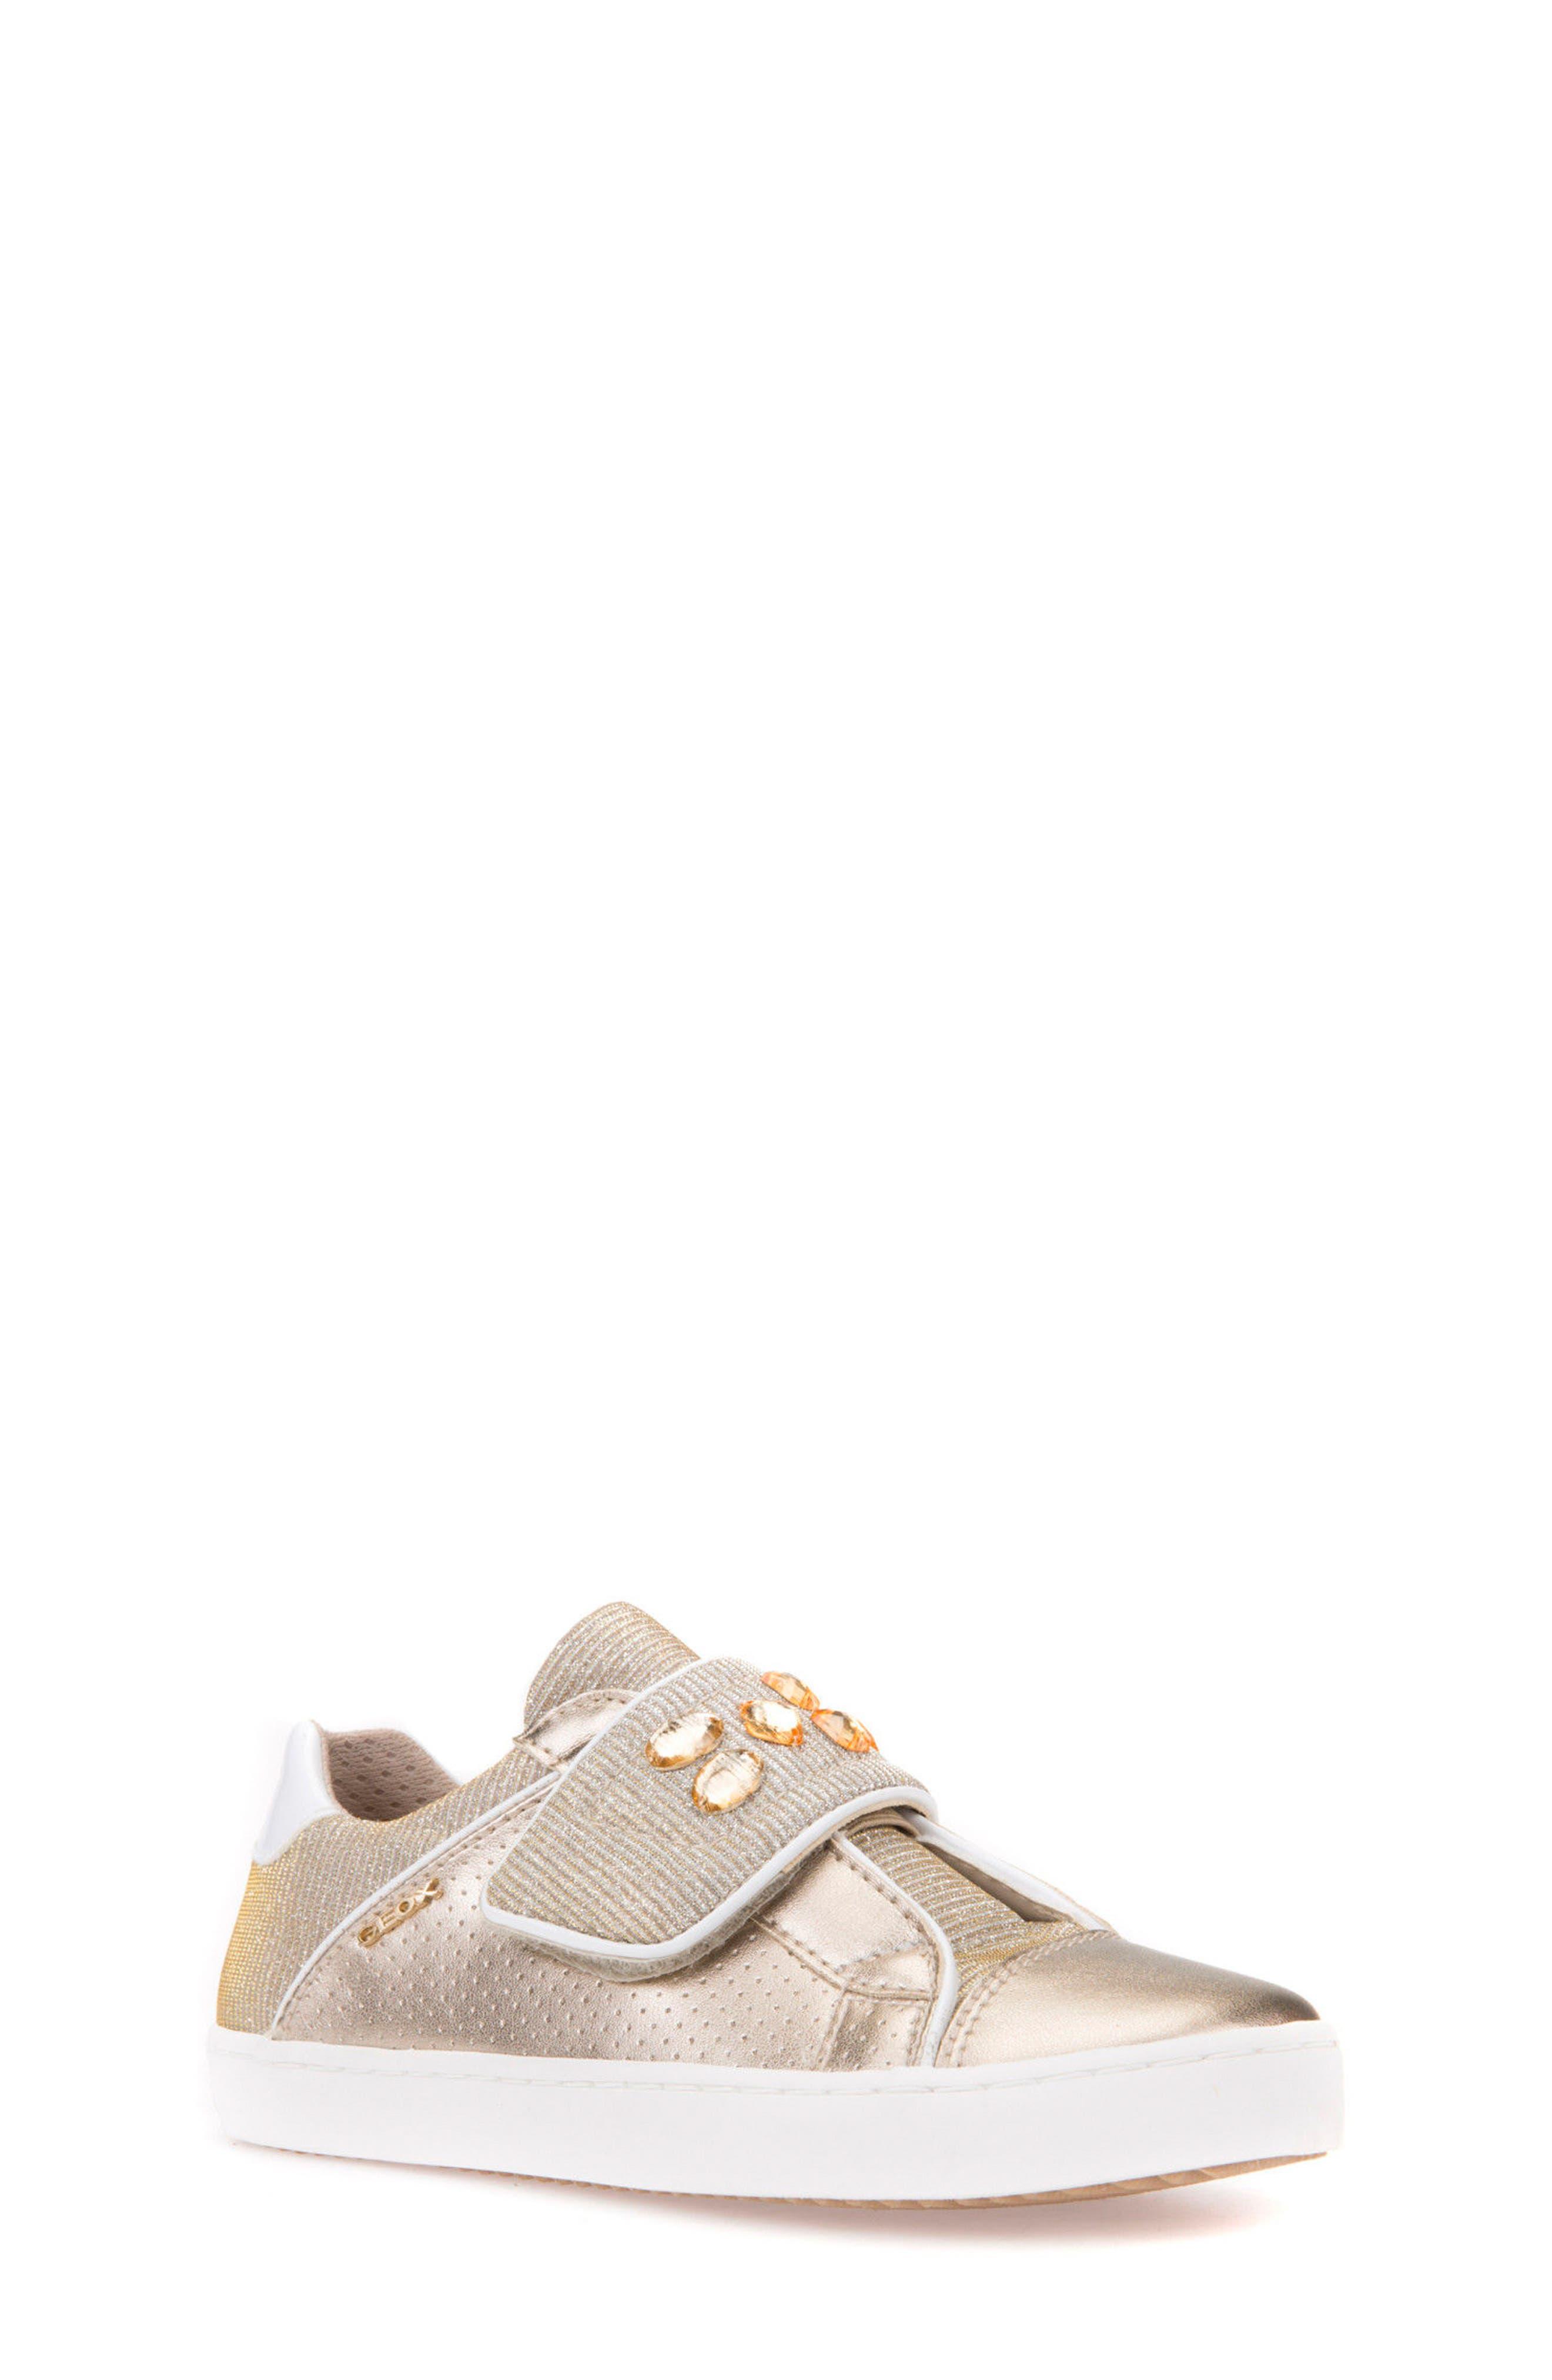 Kilwi Metallic Embellished Sneaker,                             Main thumbnail 1, color,                             GOLD